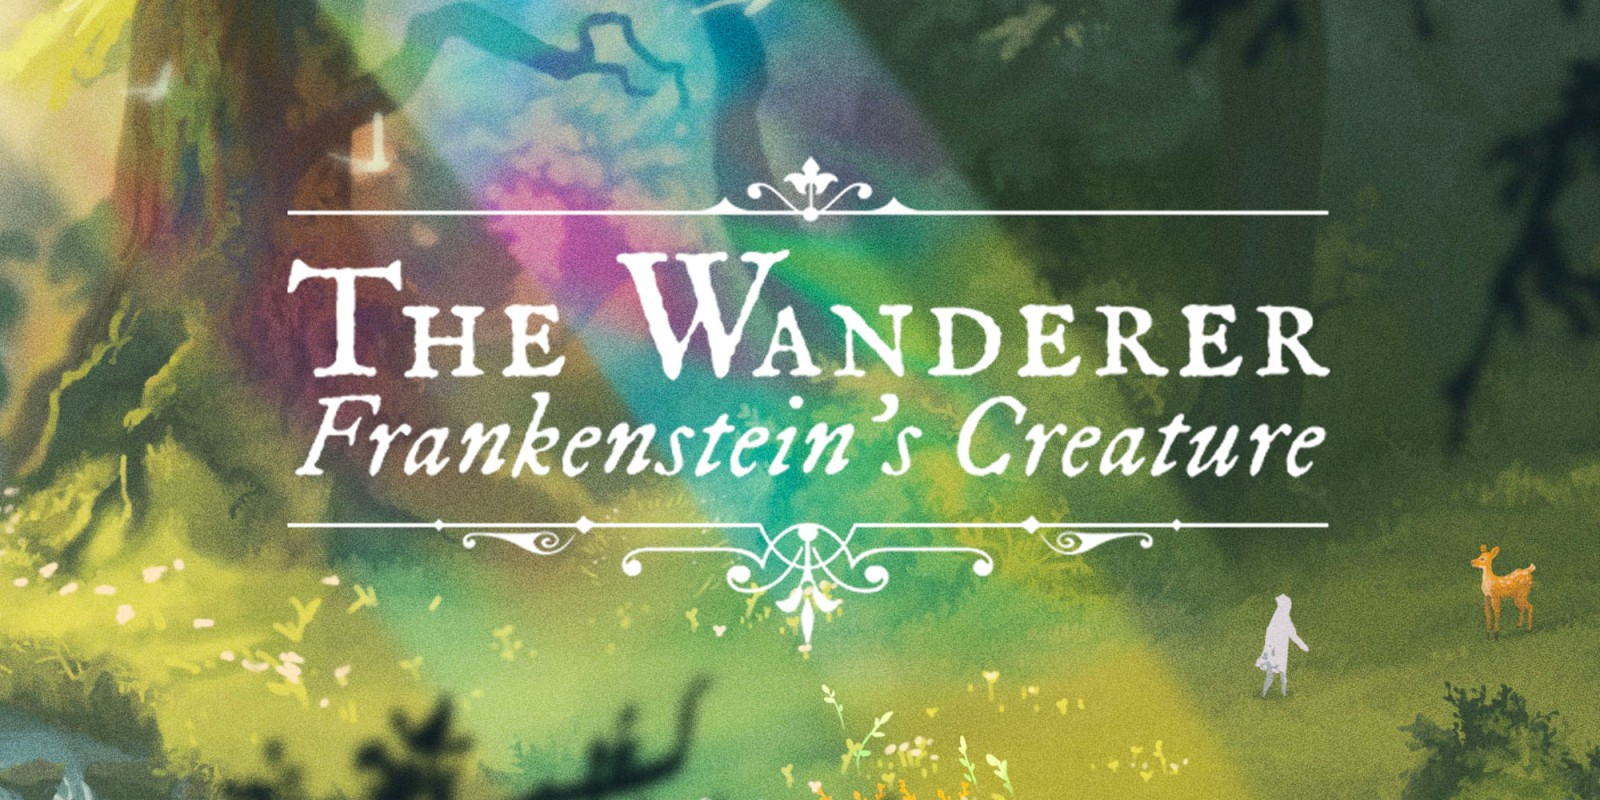 The Wanderer Frankensteins Creature